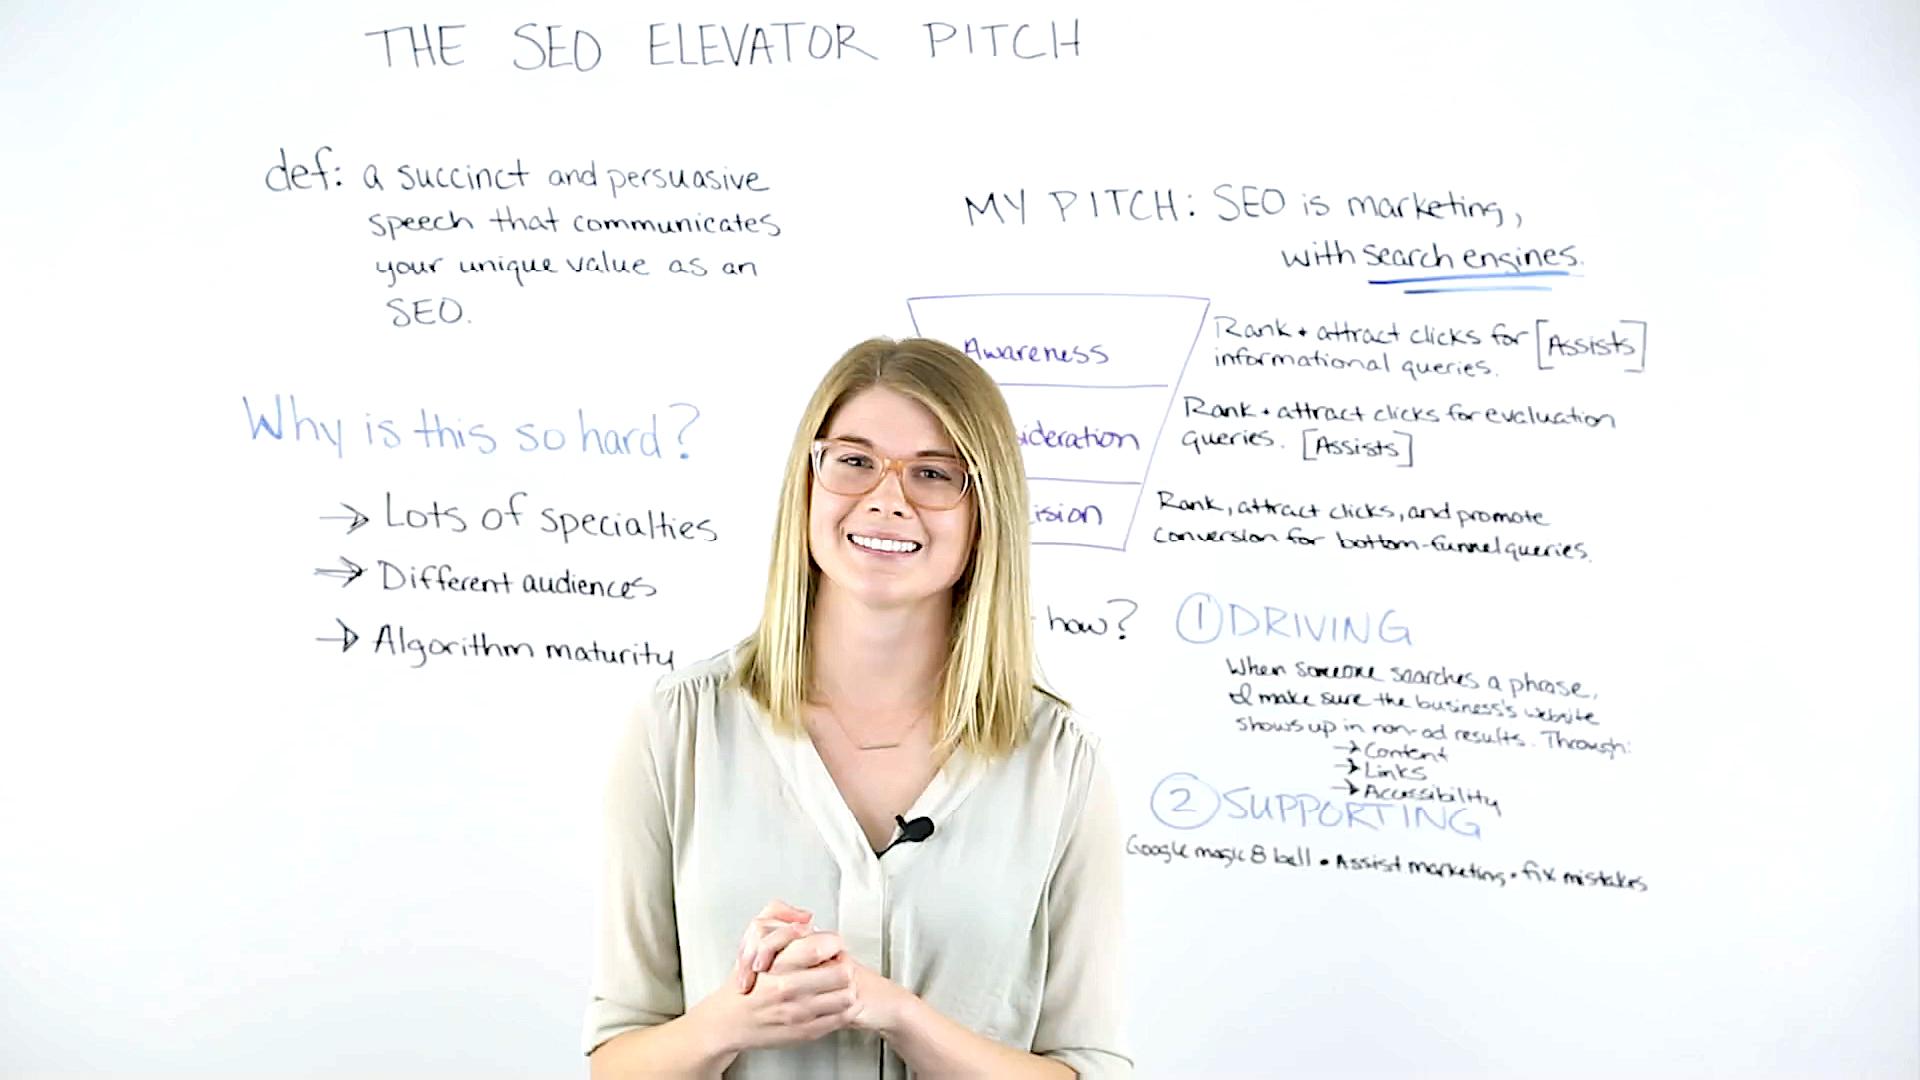 SEO Elevator Pitch - بهترین جمعه Whiteboard